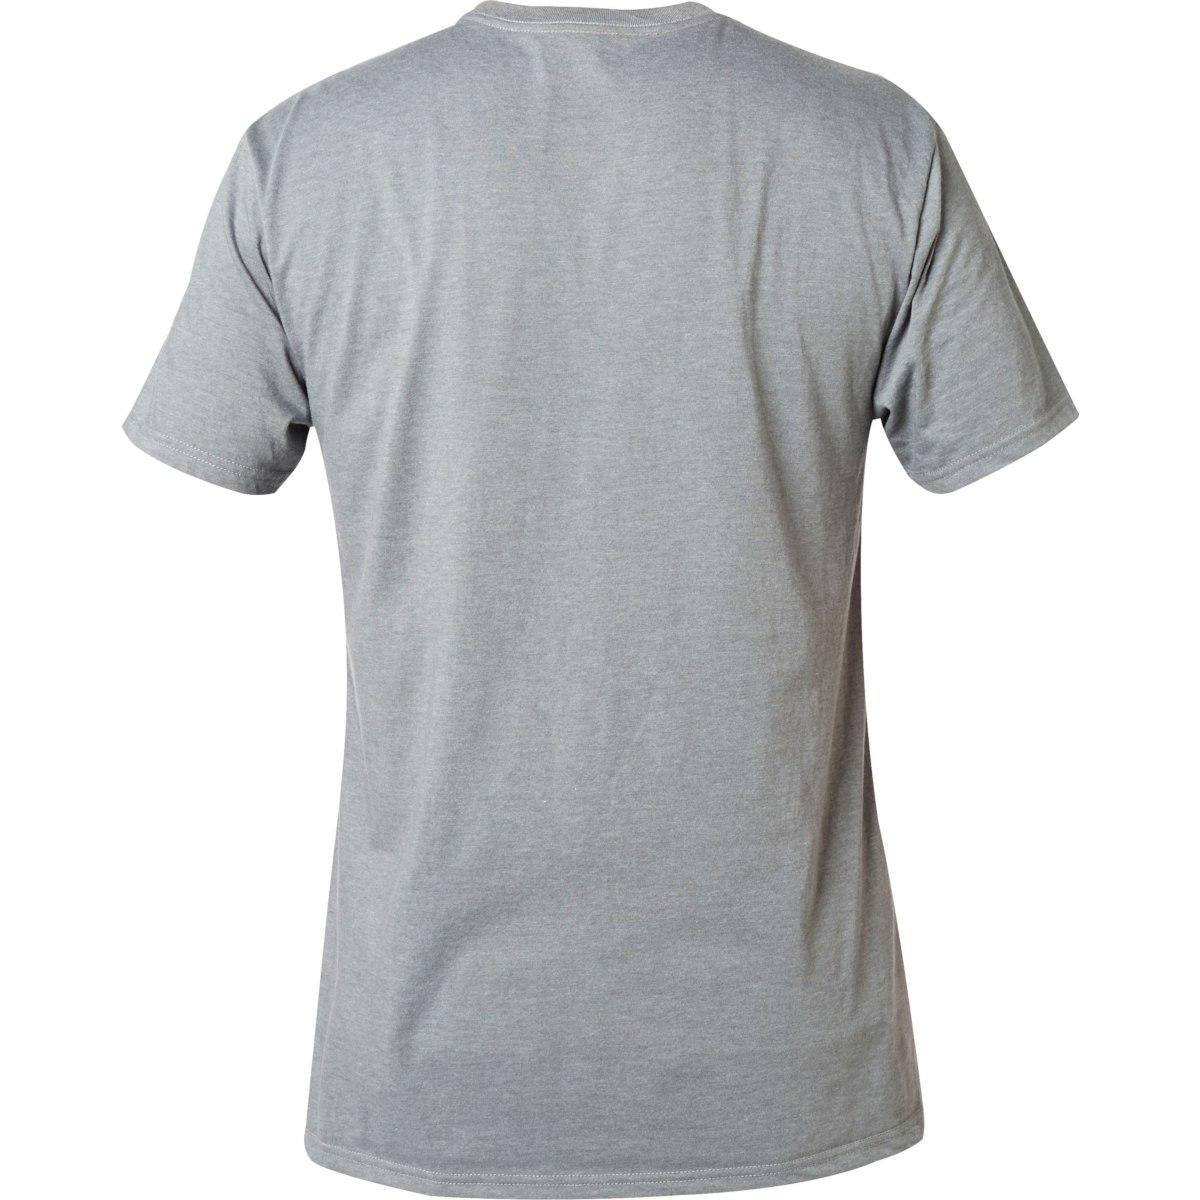 Image of Fox Legacy Moth Tee Shortsleeve Shirt - heather graphite